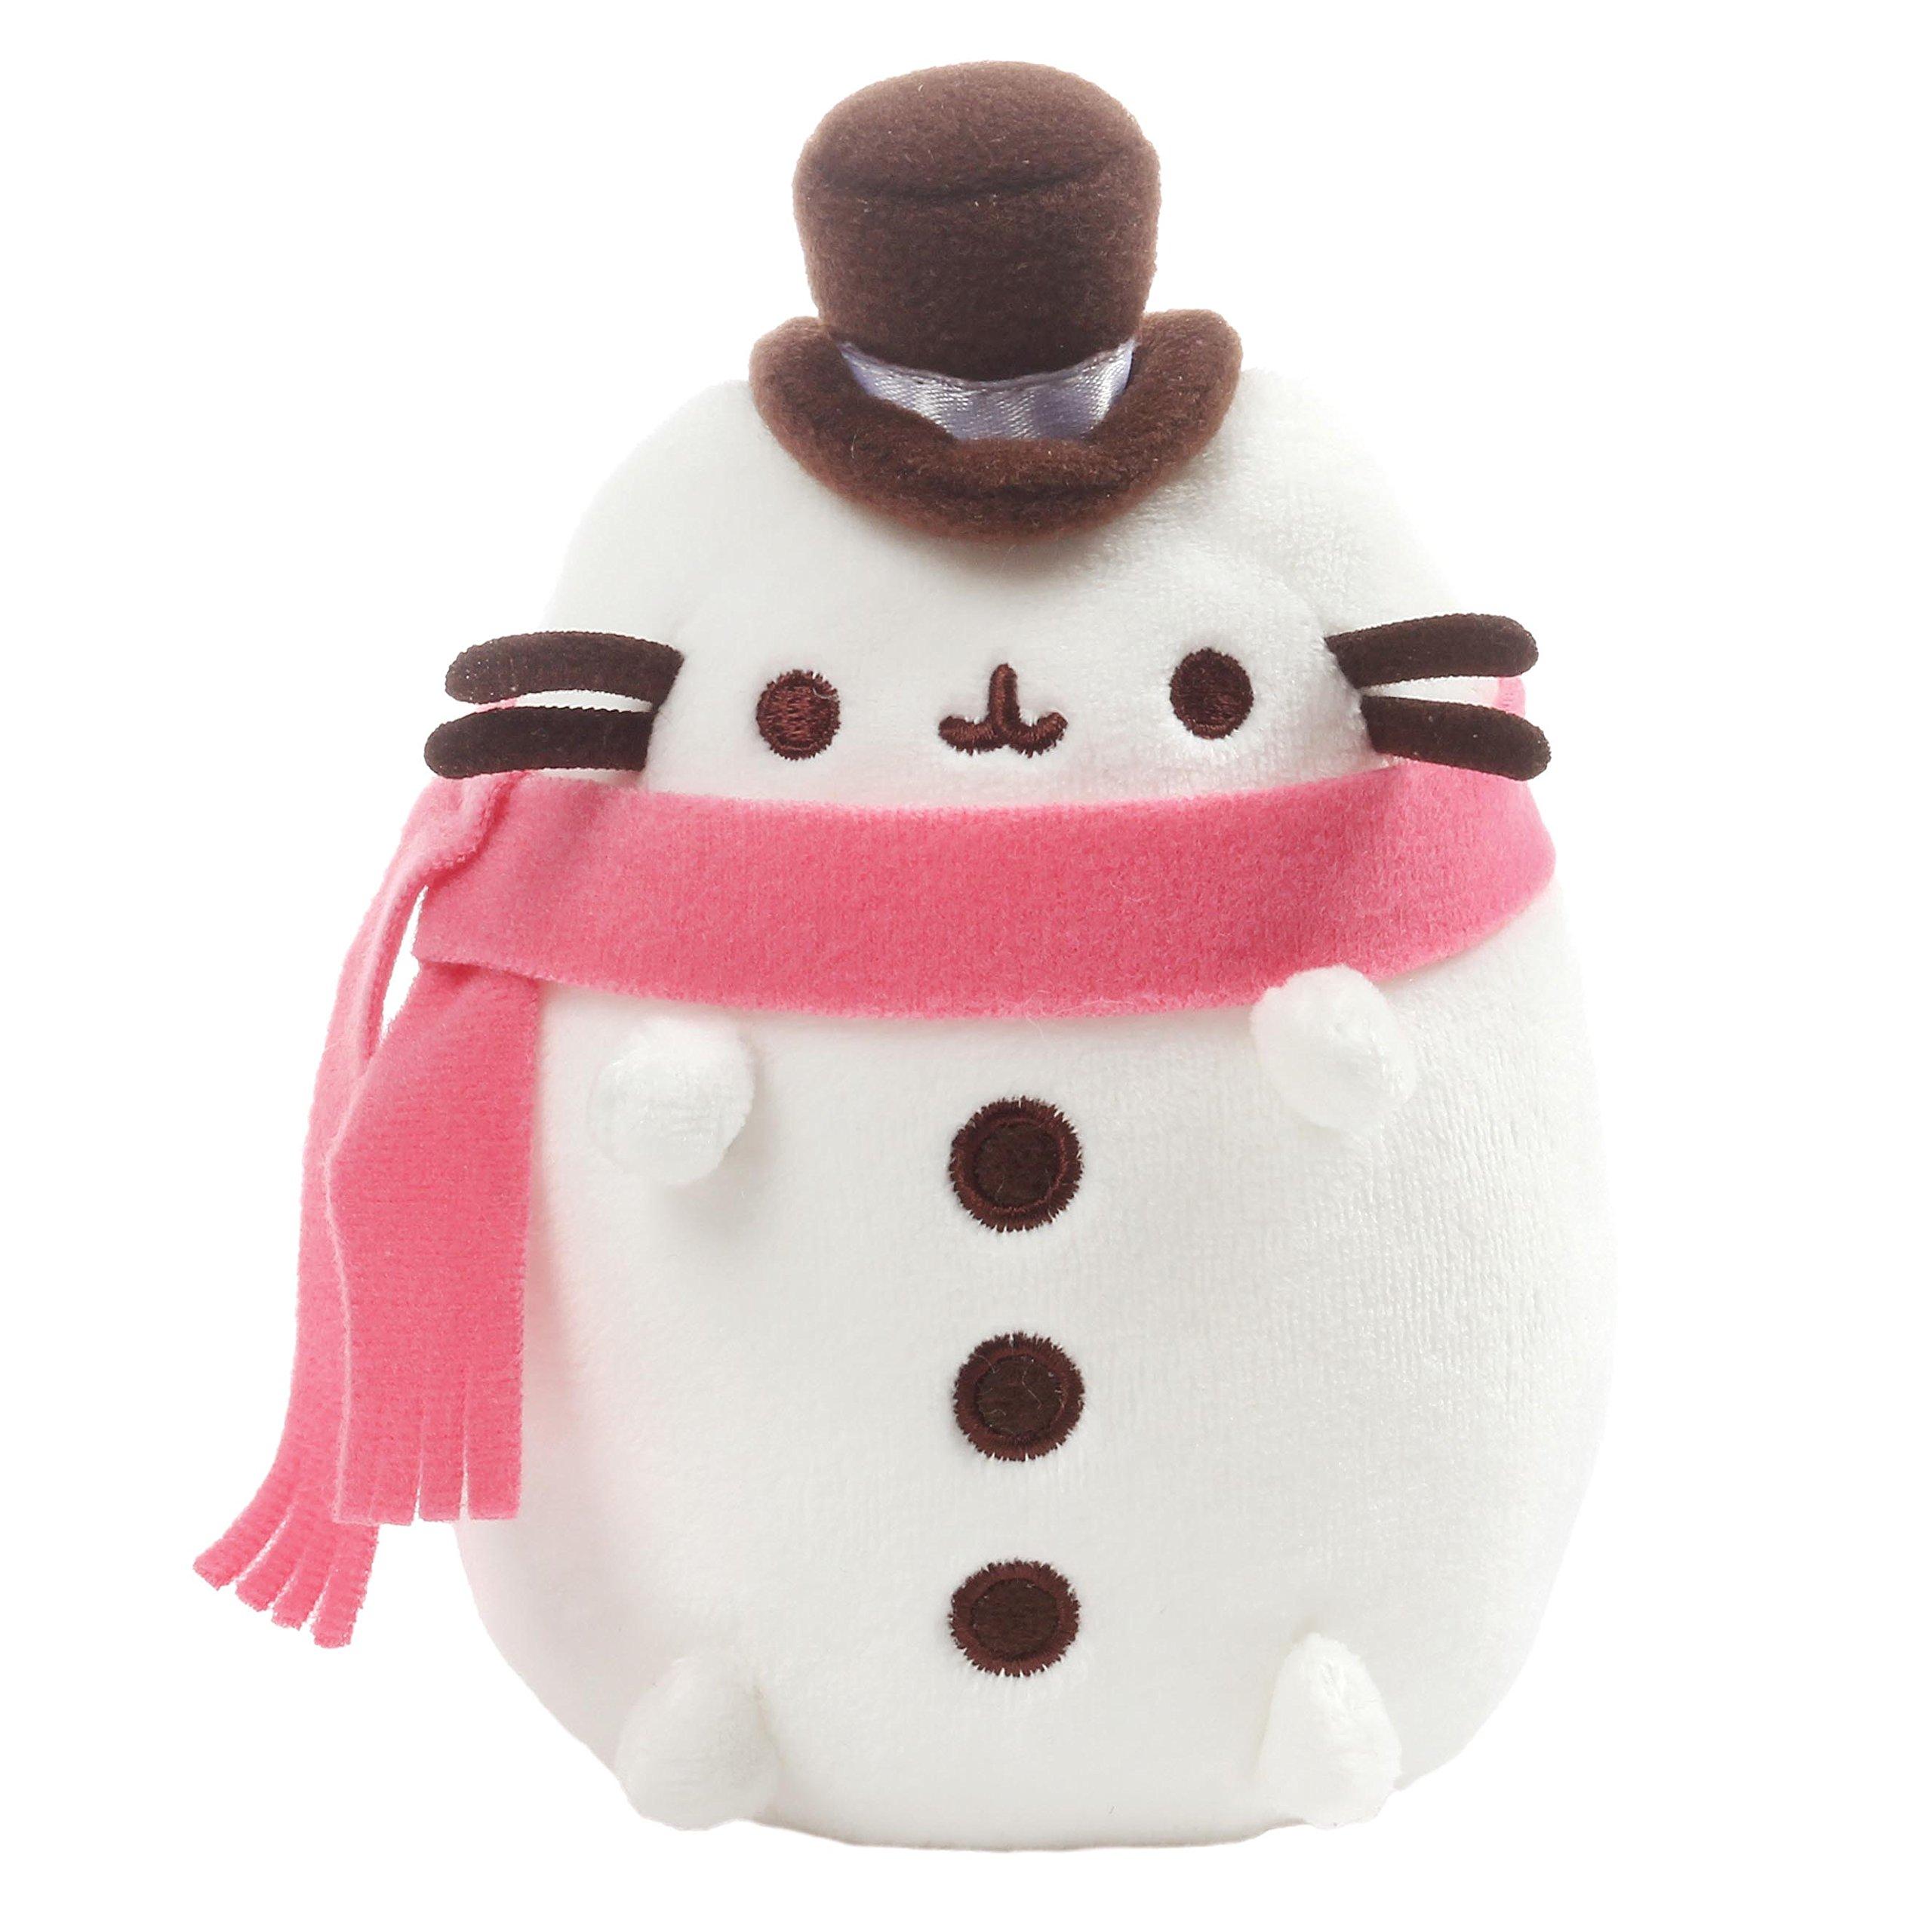 "GUND Pusheen Christmas Snowman Plush 6"" Stuffed Animal, White by GUND"